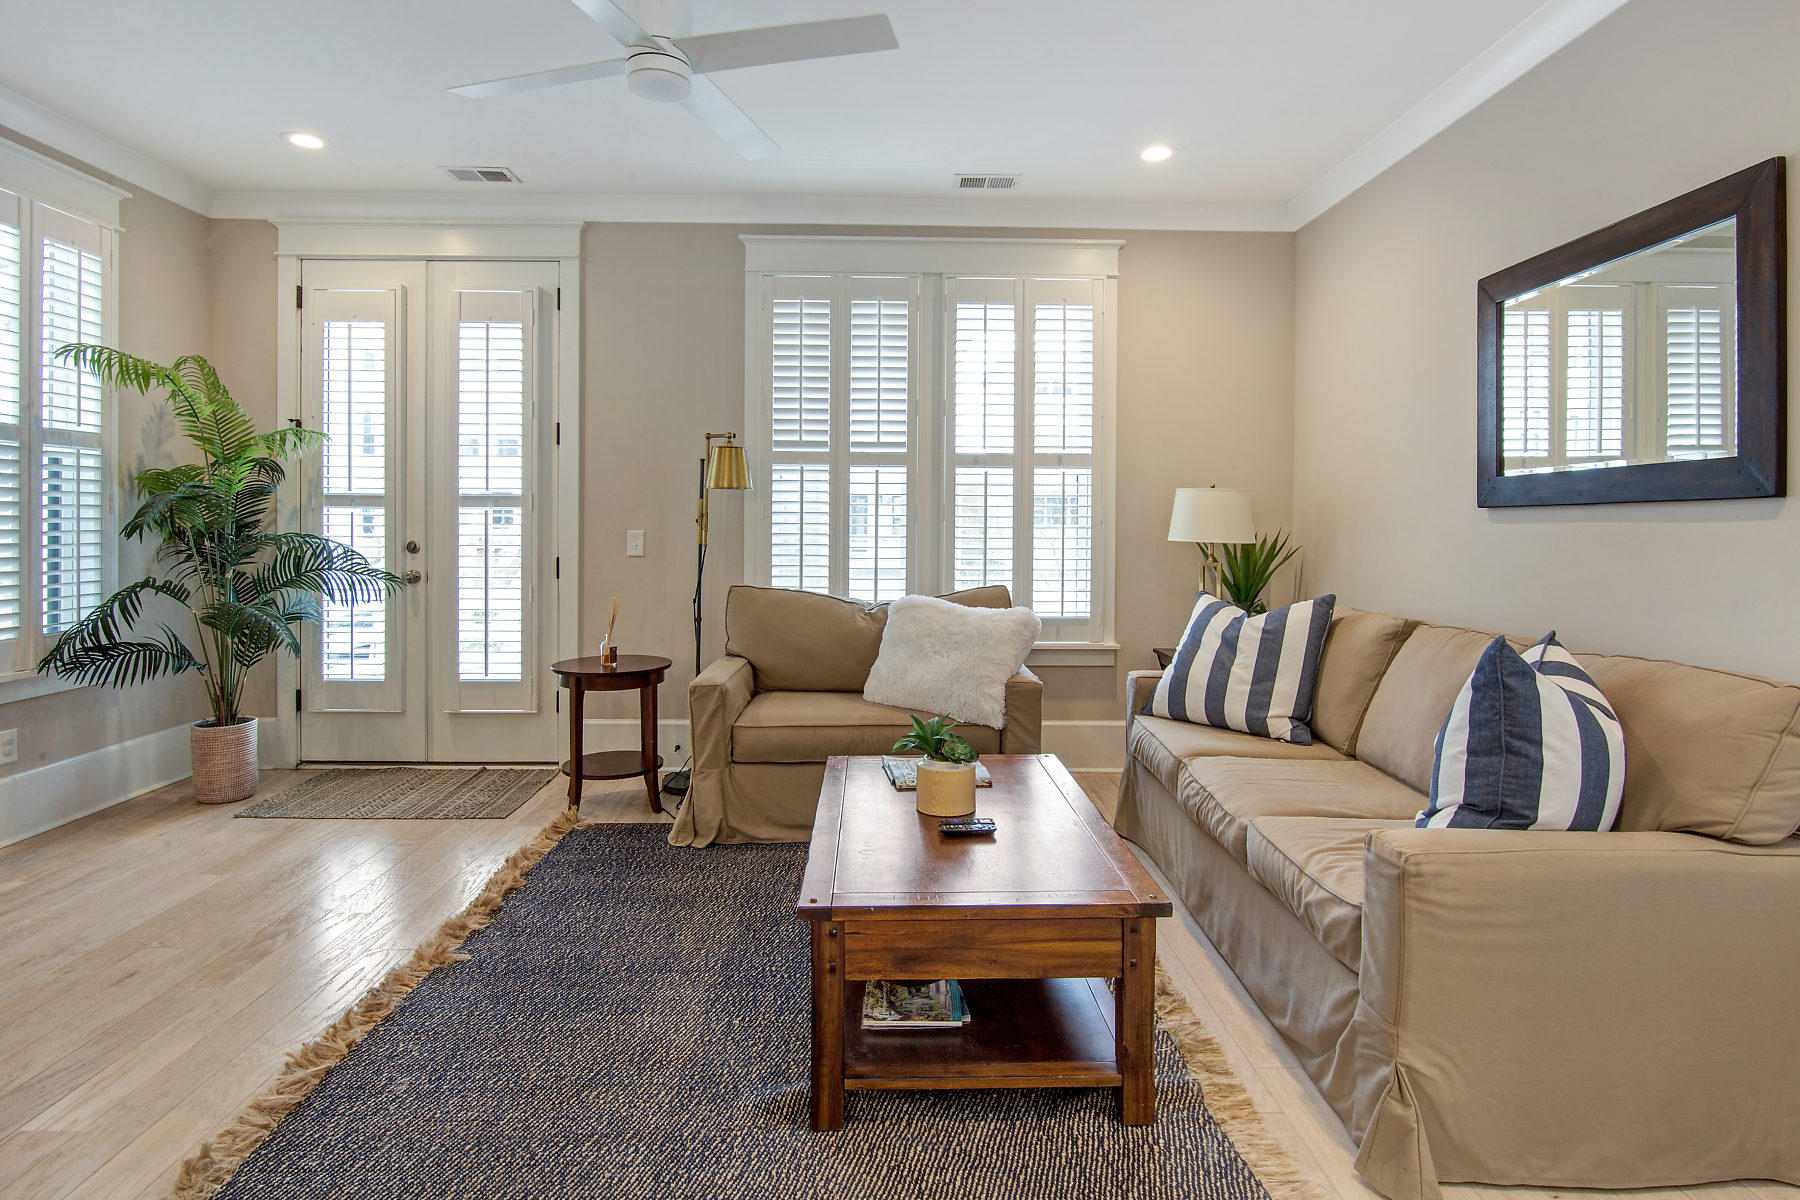 Sullivans Pointe Homes For Sale - 964 Key Colony, Mount Pleasant, SC - 13